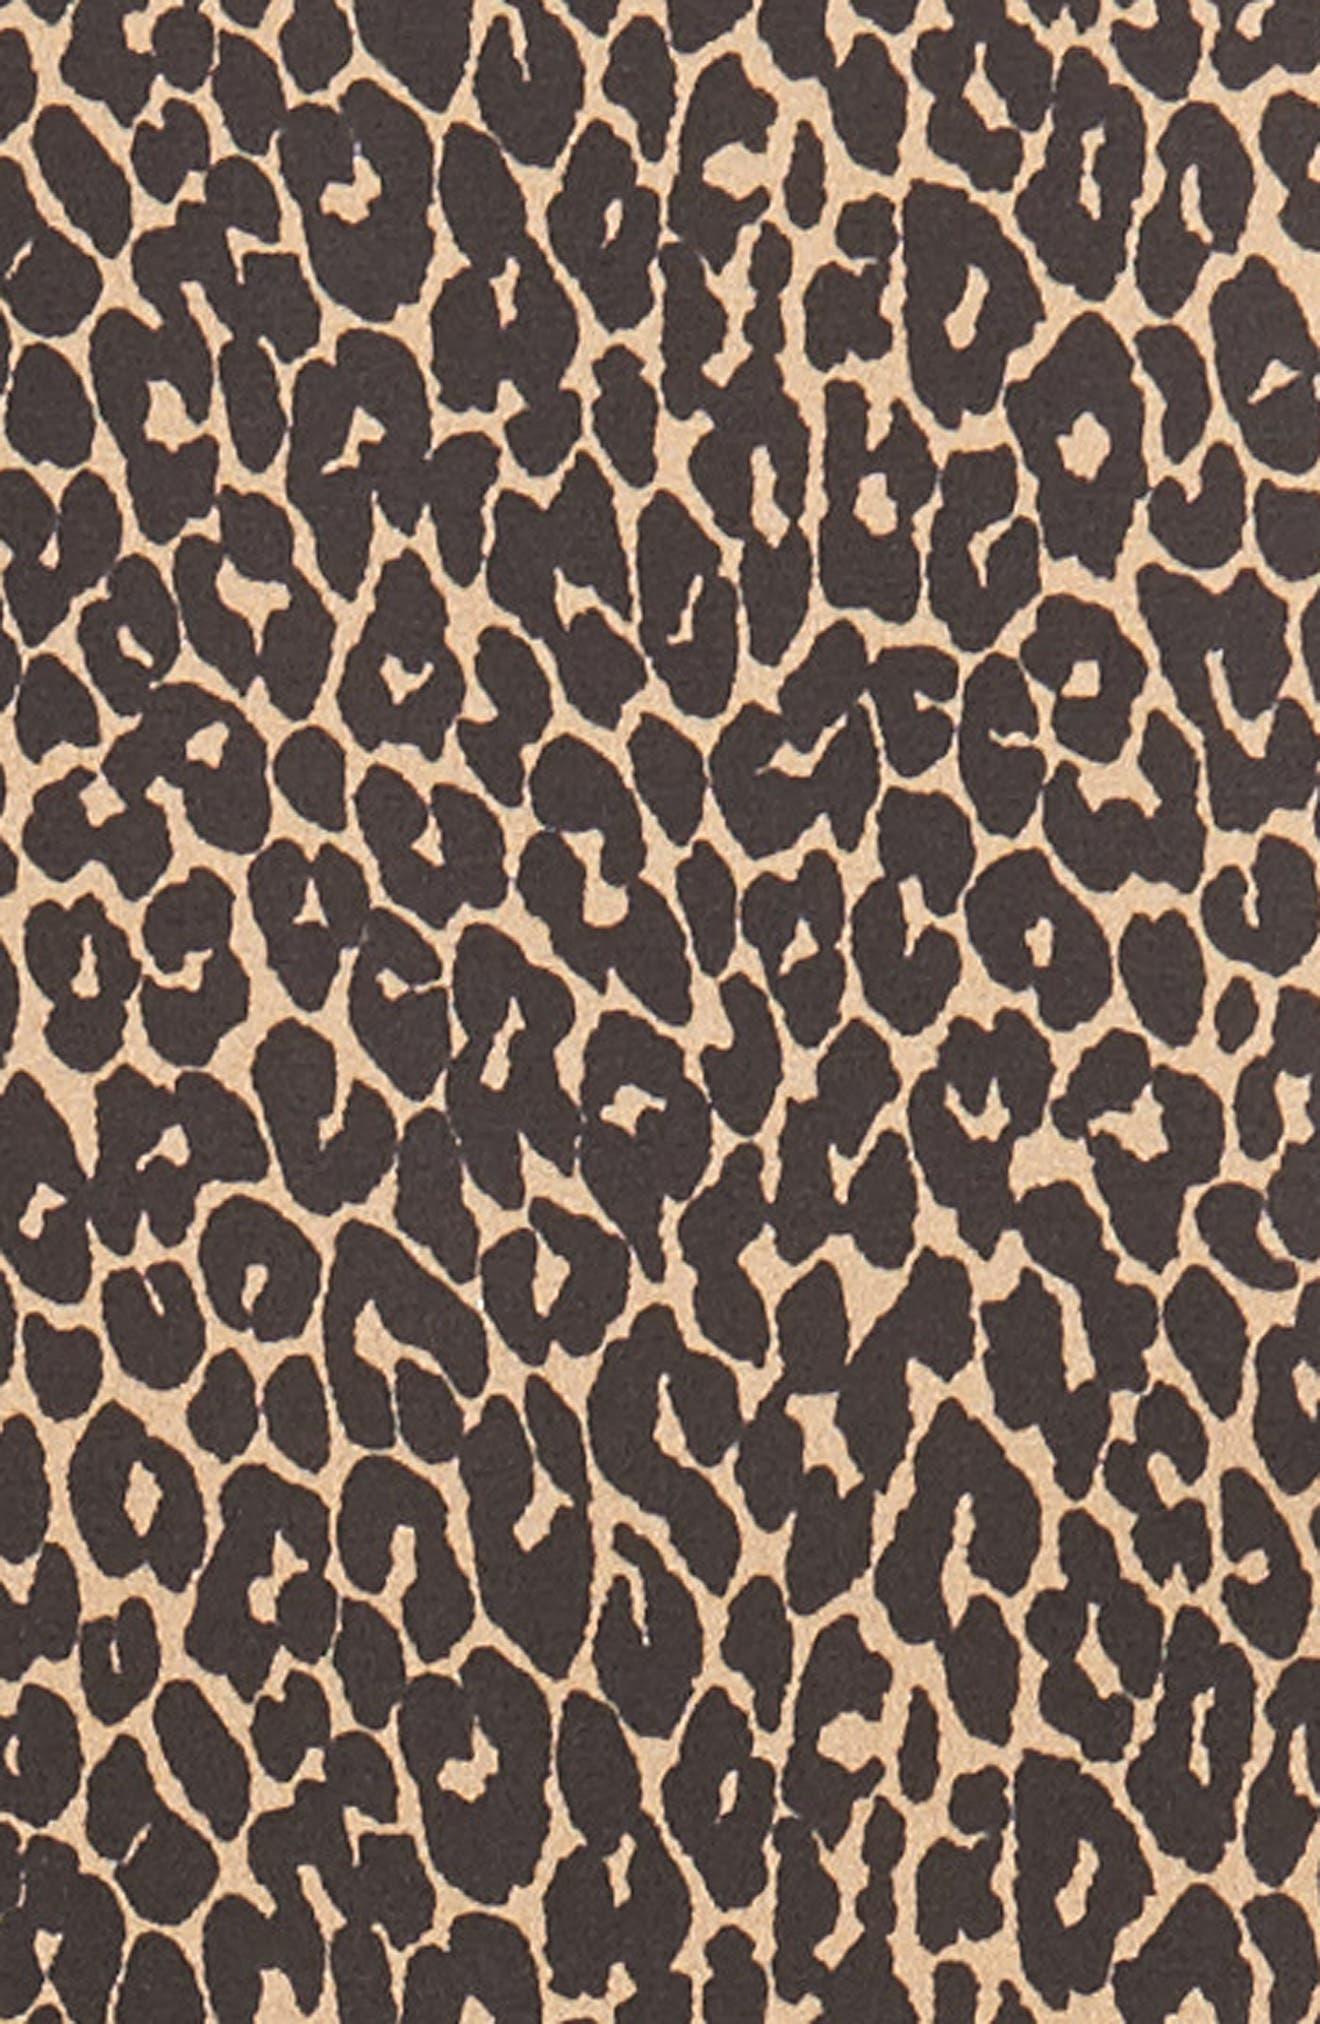 Leopard Print Silk Georgette Shirtdress,                             Alternate thumbnail 6, color,                             200